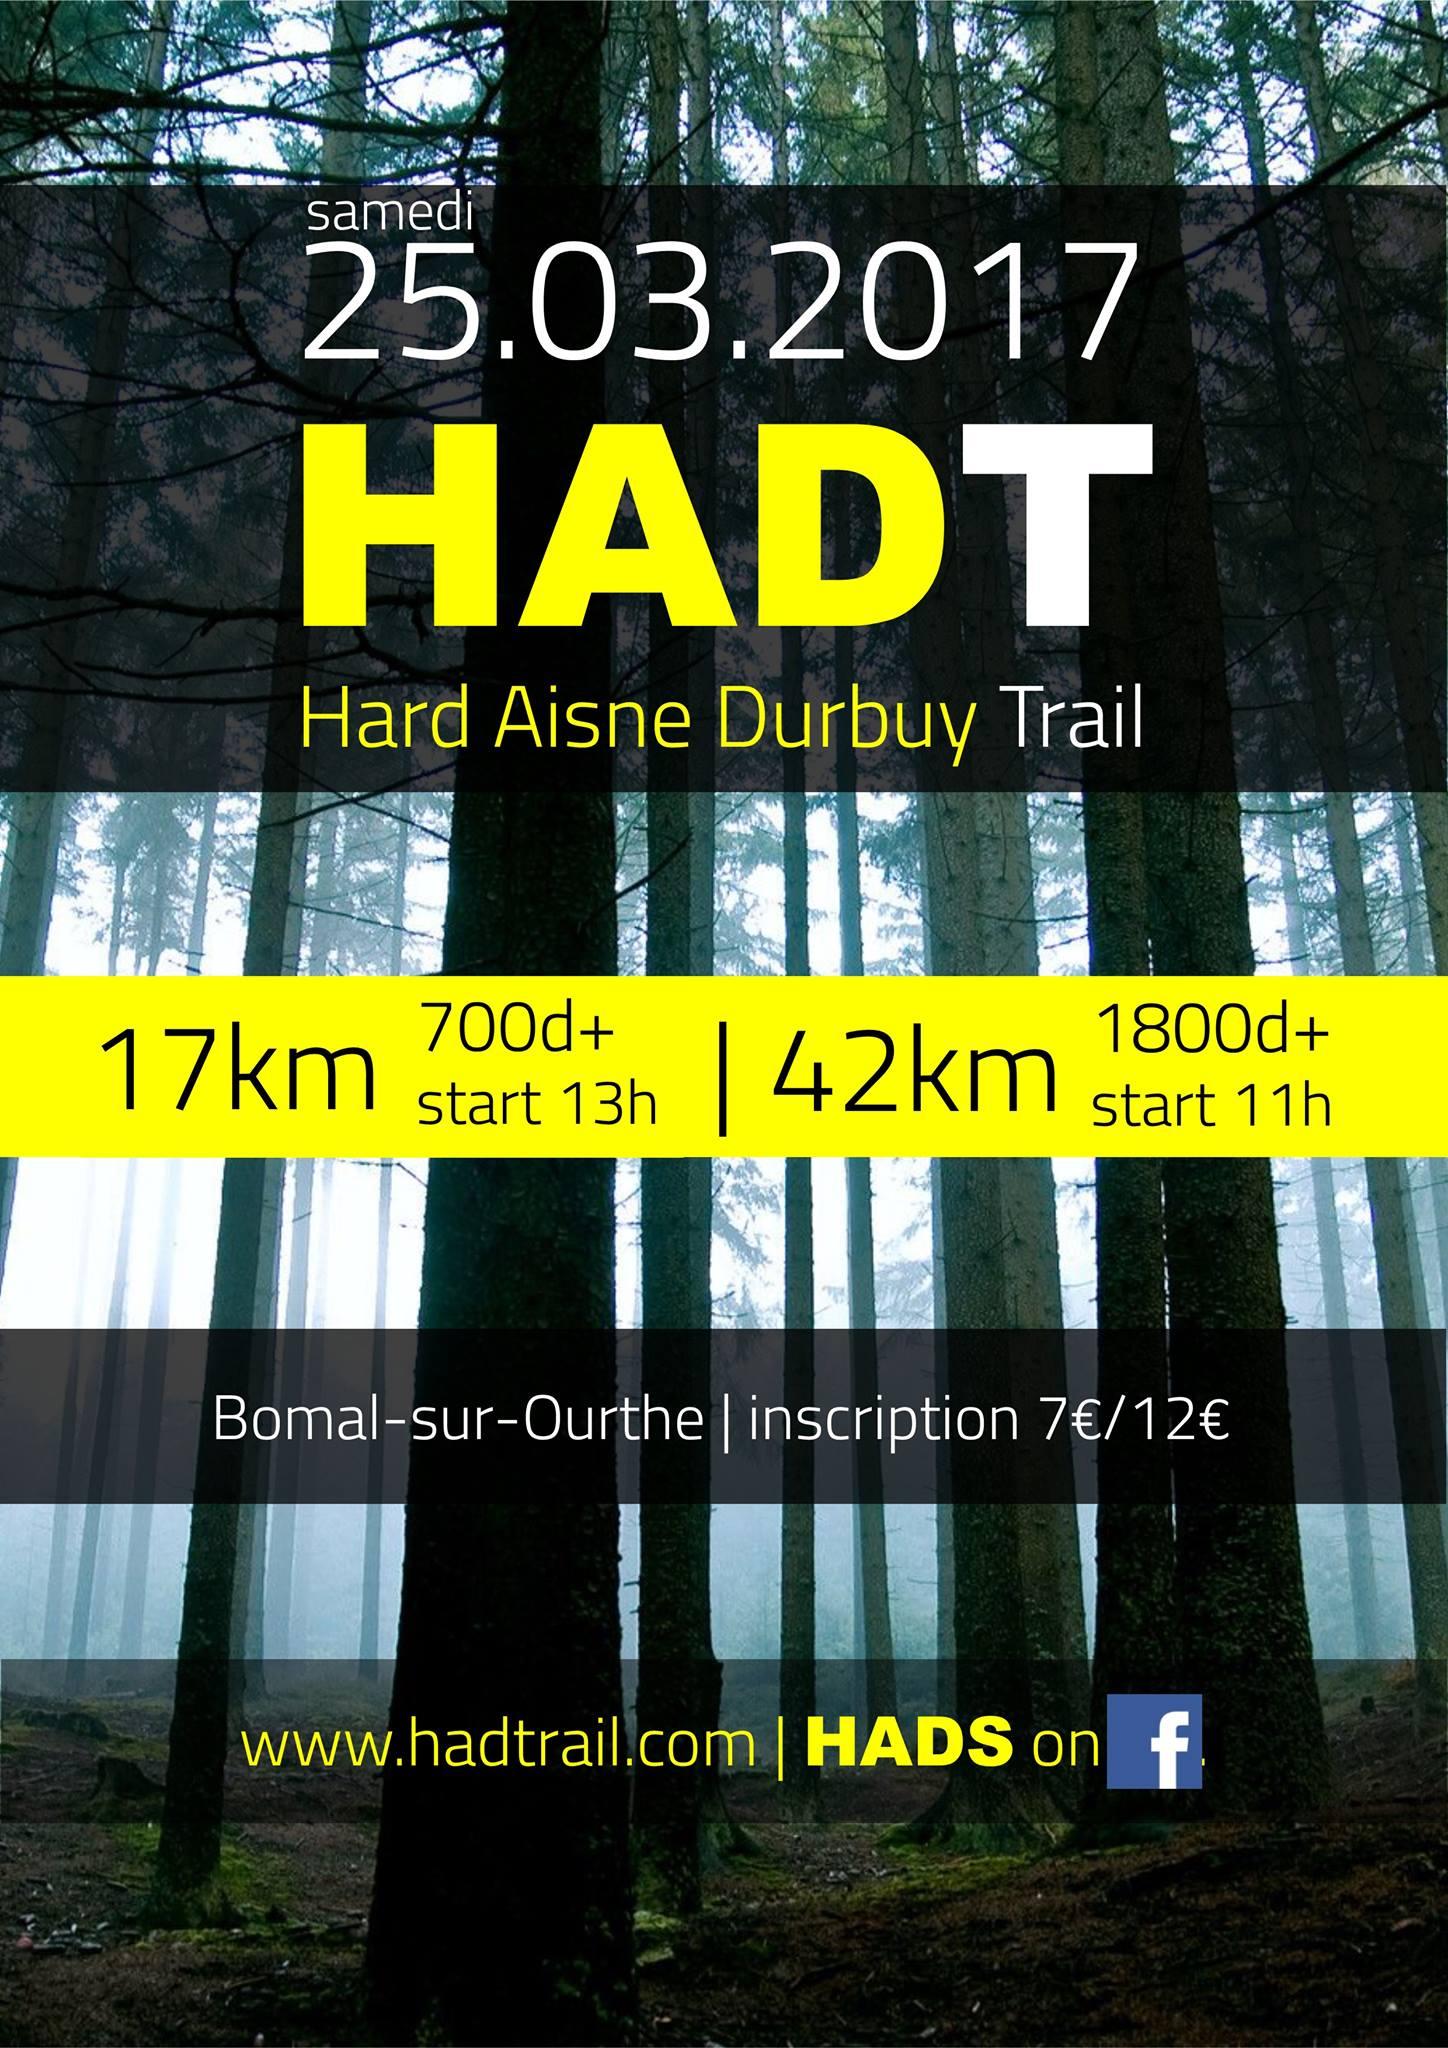 Hard'Aisne Durbuy Trail